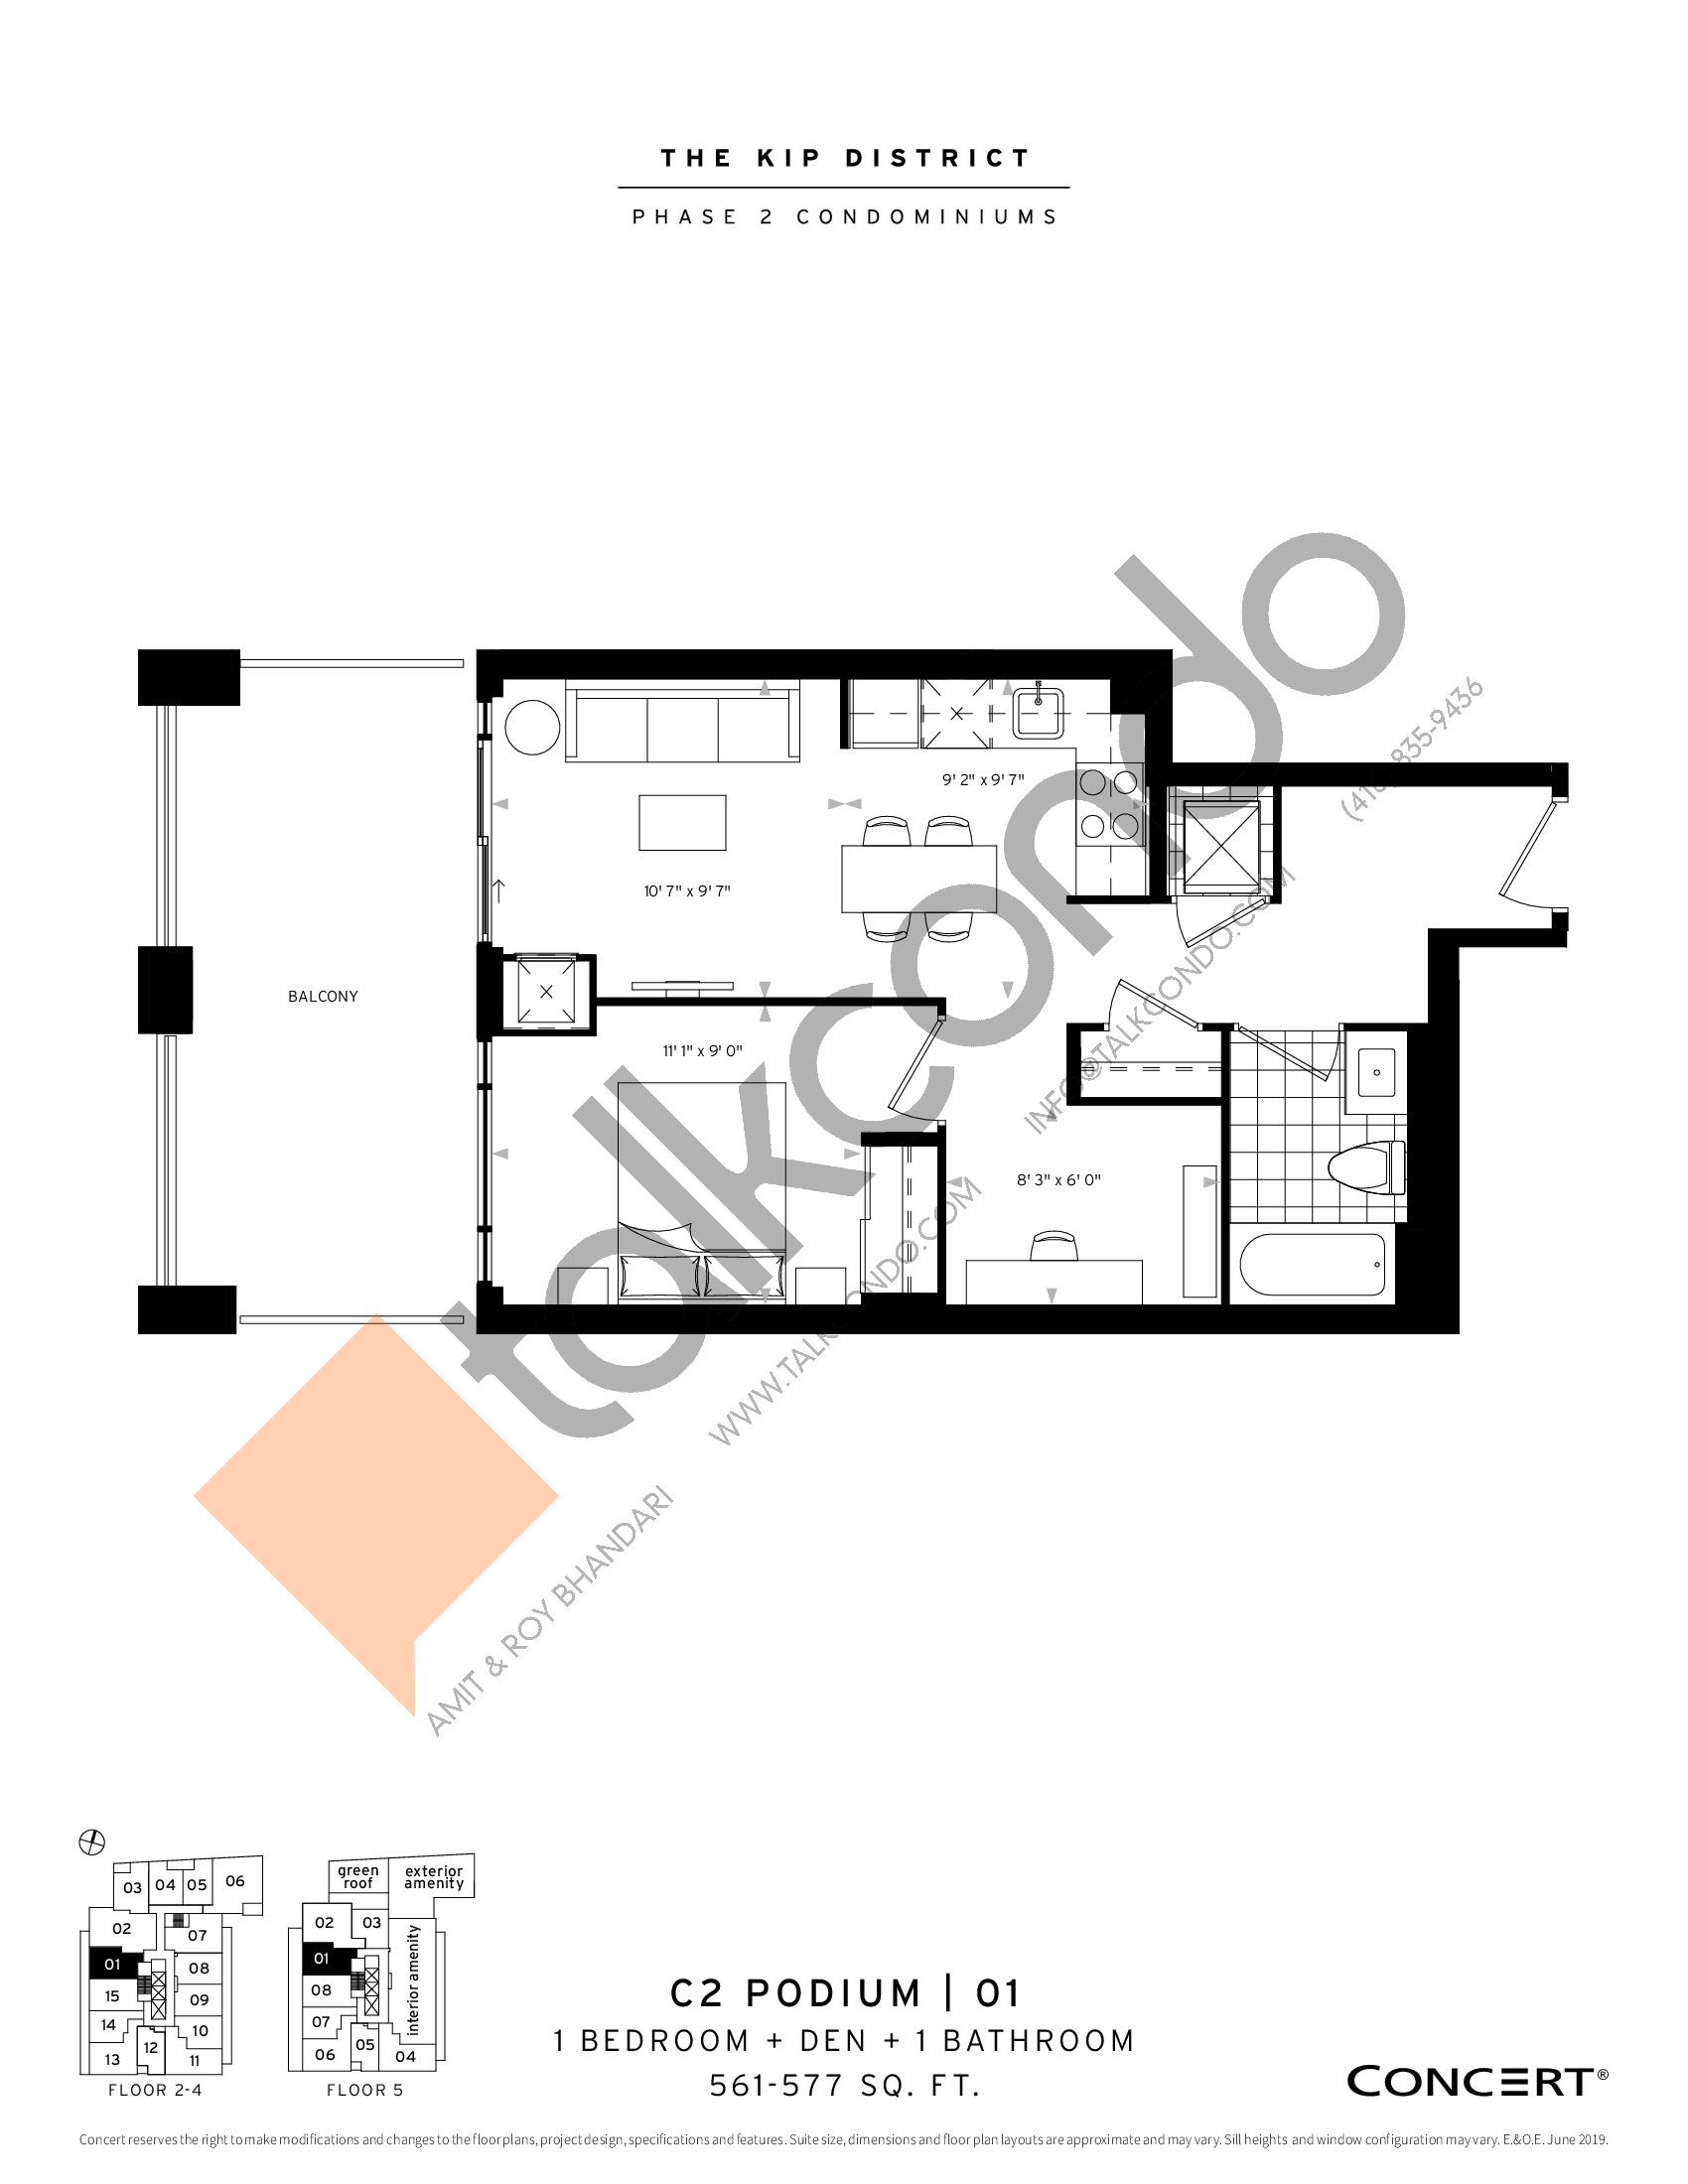 C2 Podium | 01 Floor Plan at The Kip District Phase 2 Condos - 561 sq.ft